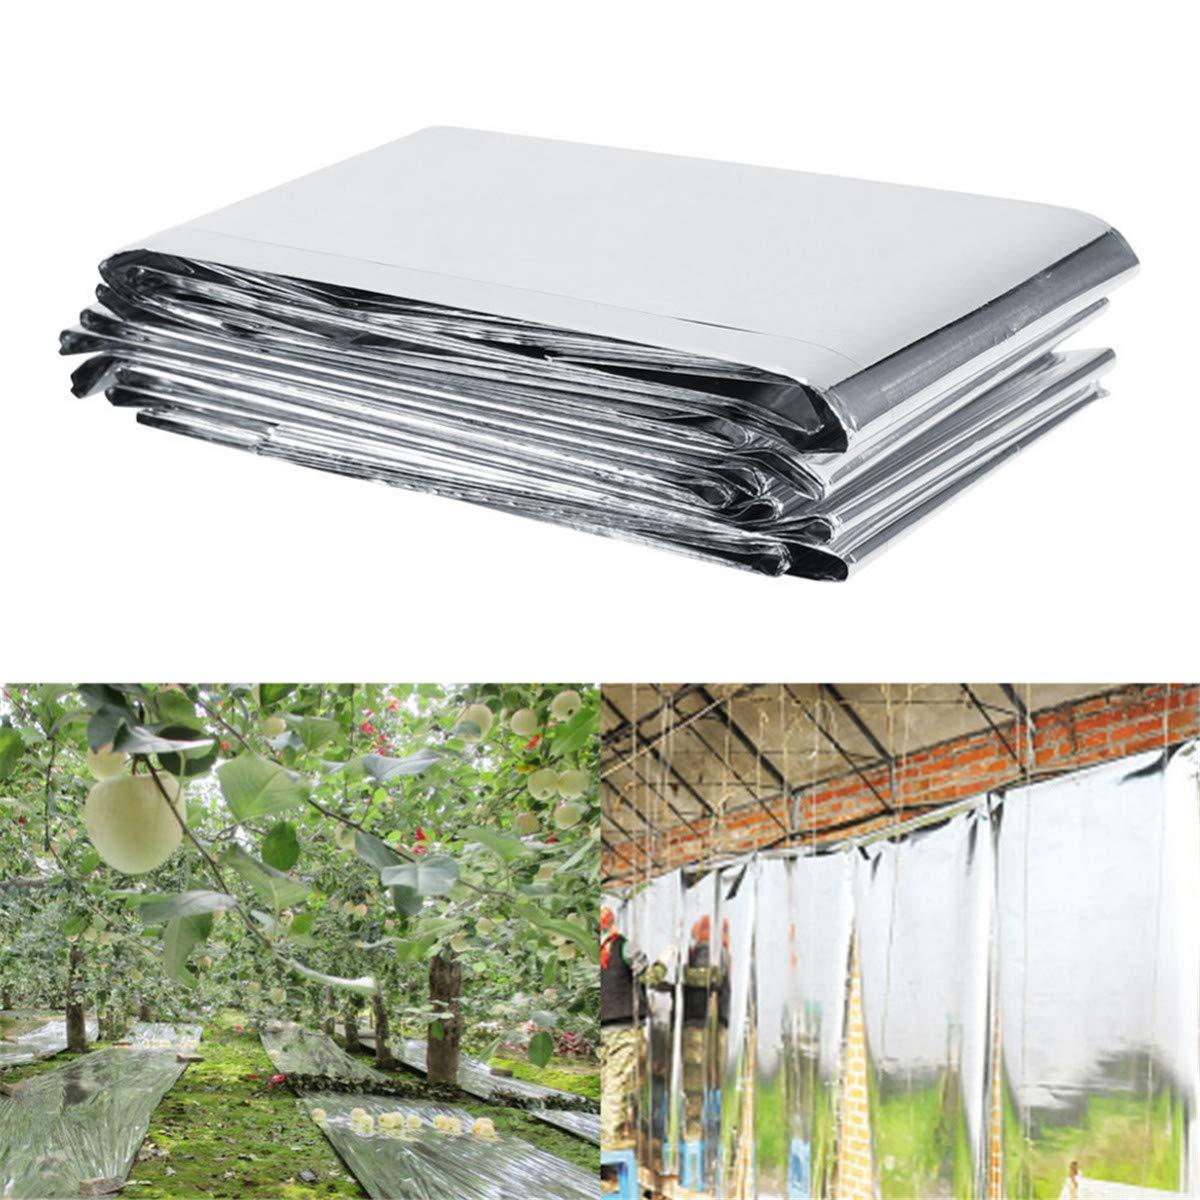 LKXHarleya Silver Reflective Mylar Film Garden Greenhouse Covering Foil Sheets Heat Control Solar Film Fruit Trees Apple Grapes Increasing Temperature Light Plant Grow,82.68 x 47.24inch